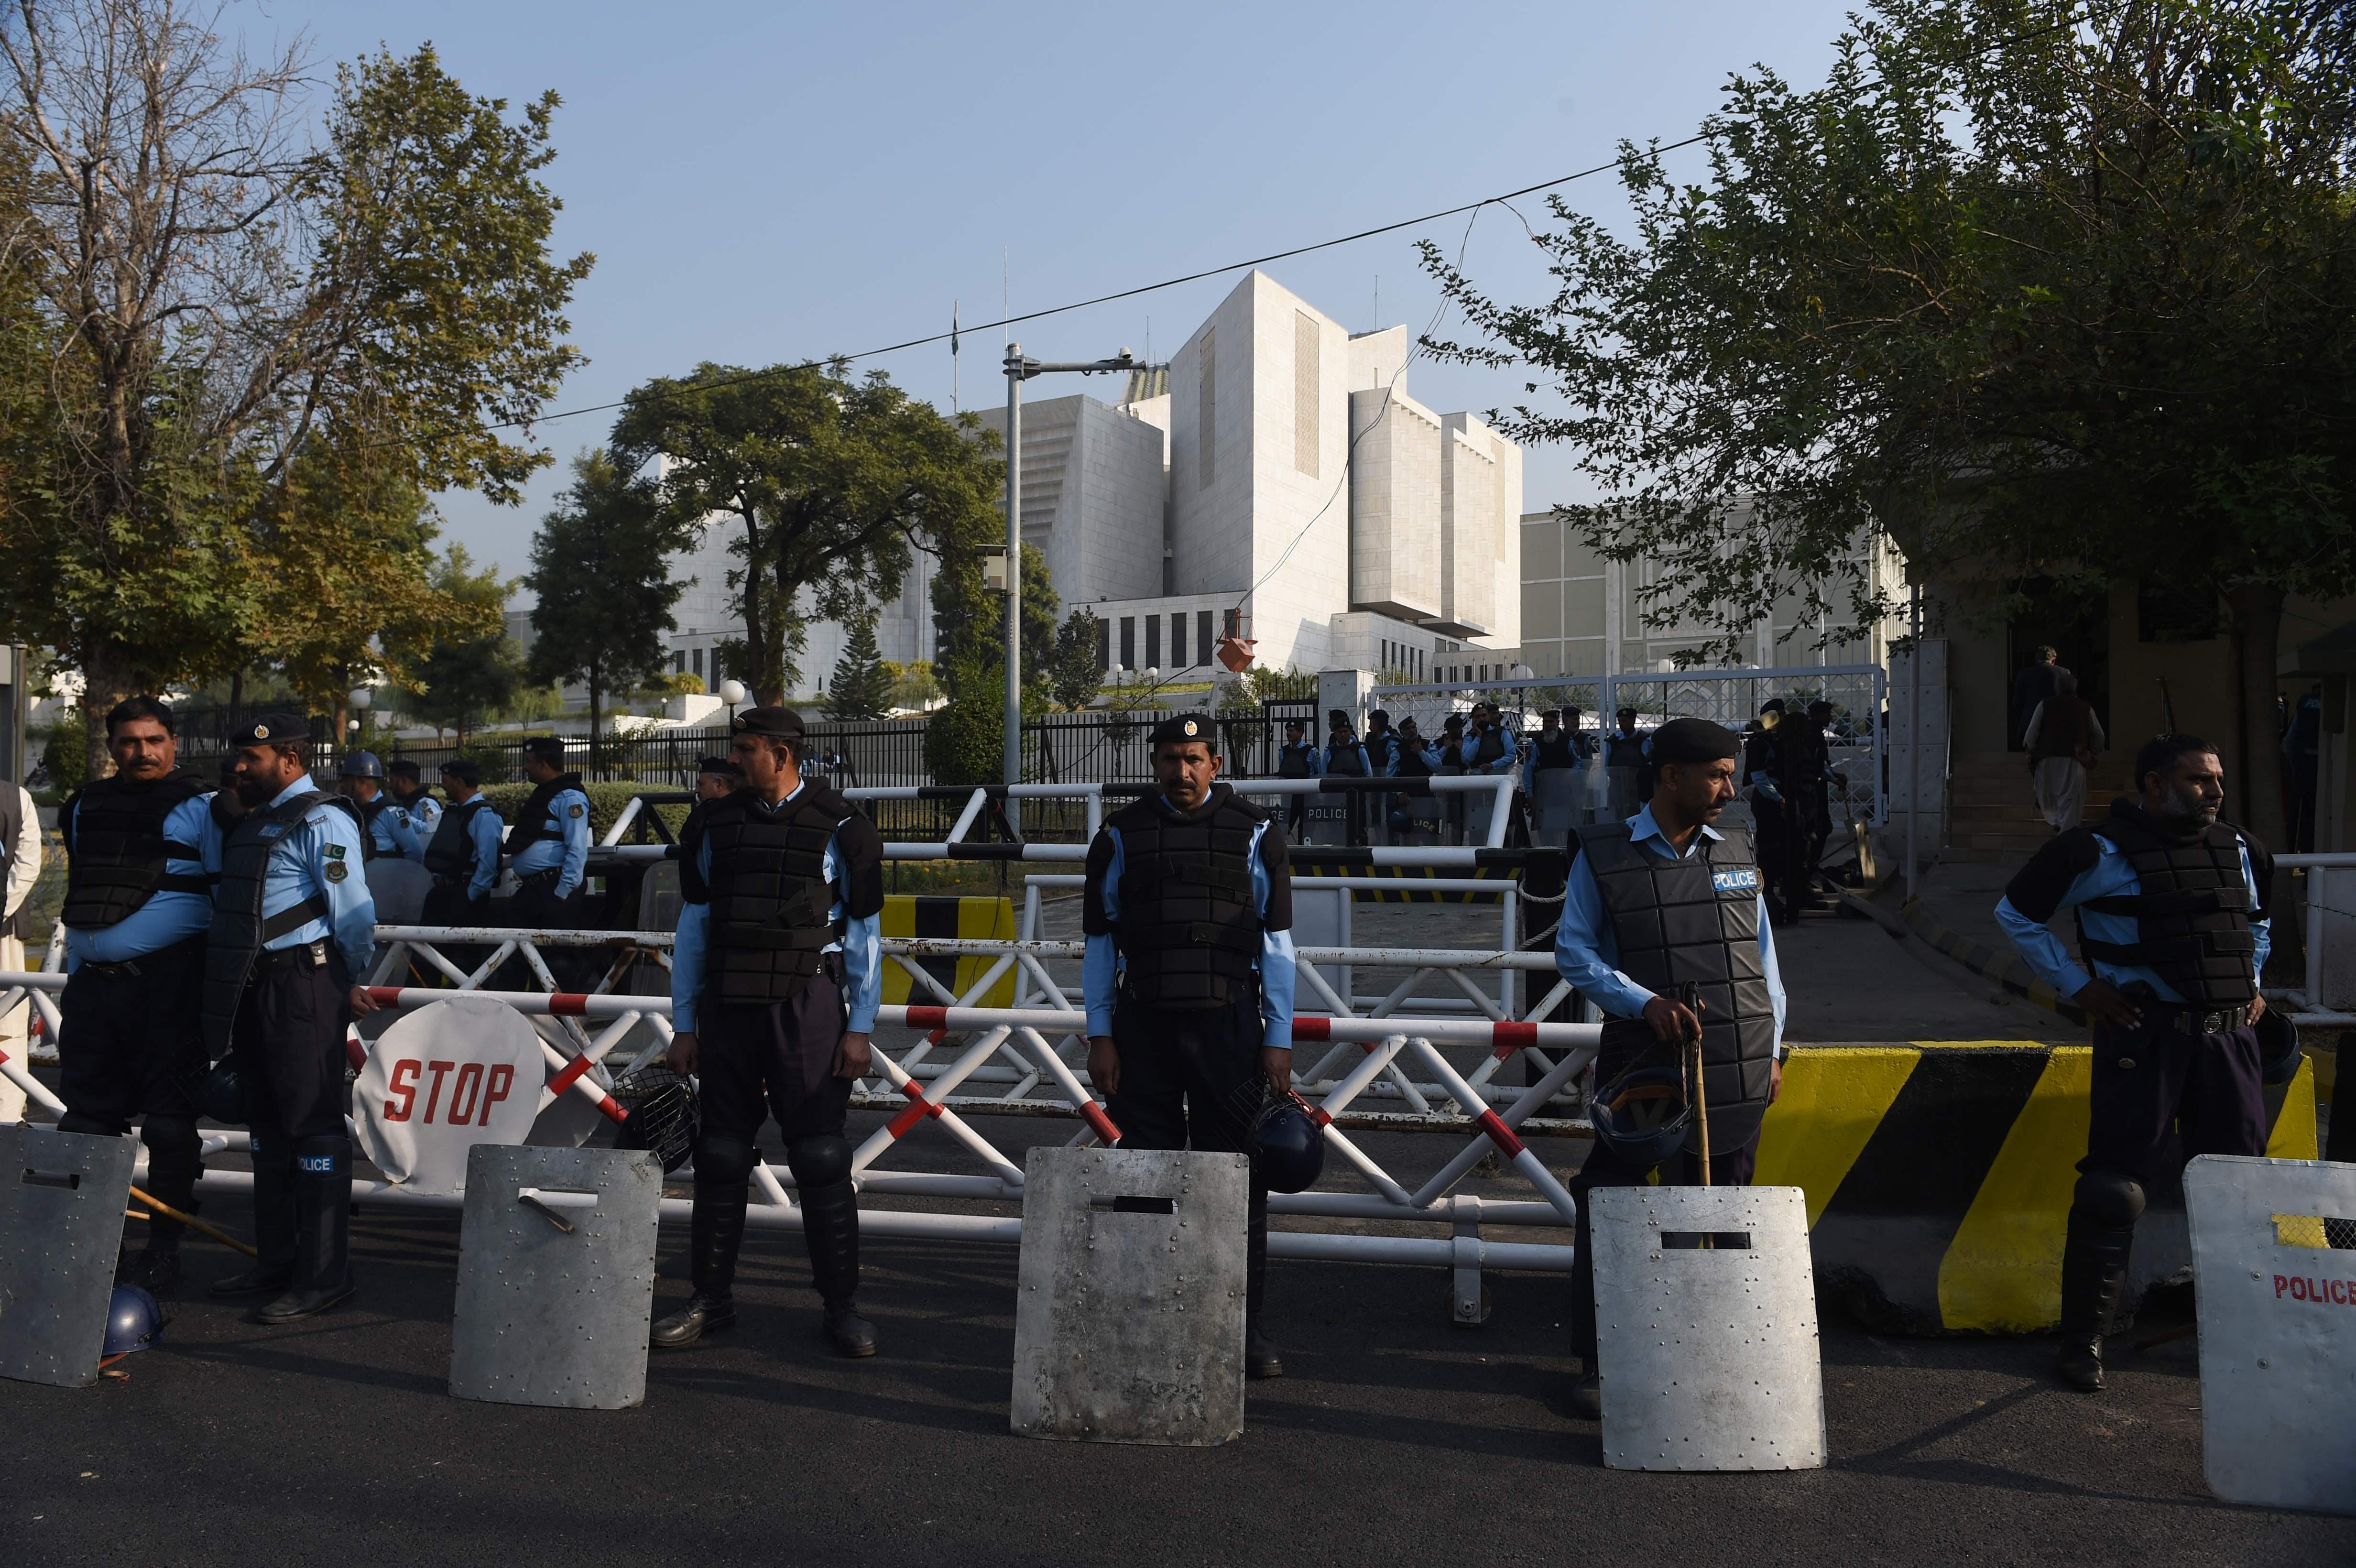 Pakistan's Imran Khan backs off from threat to shut down capital